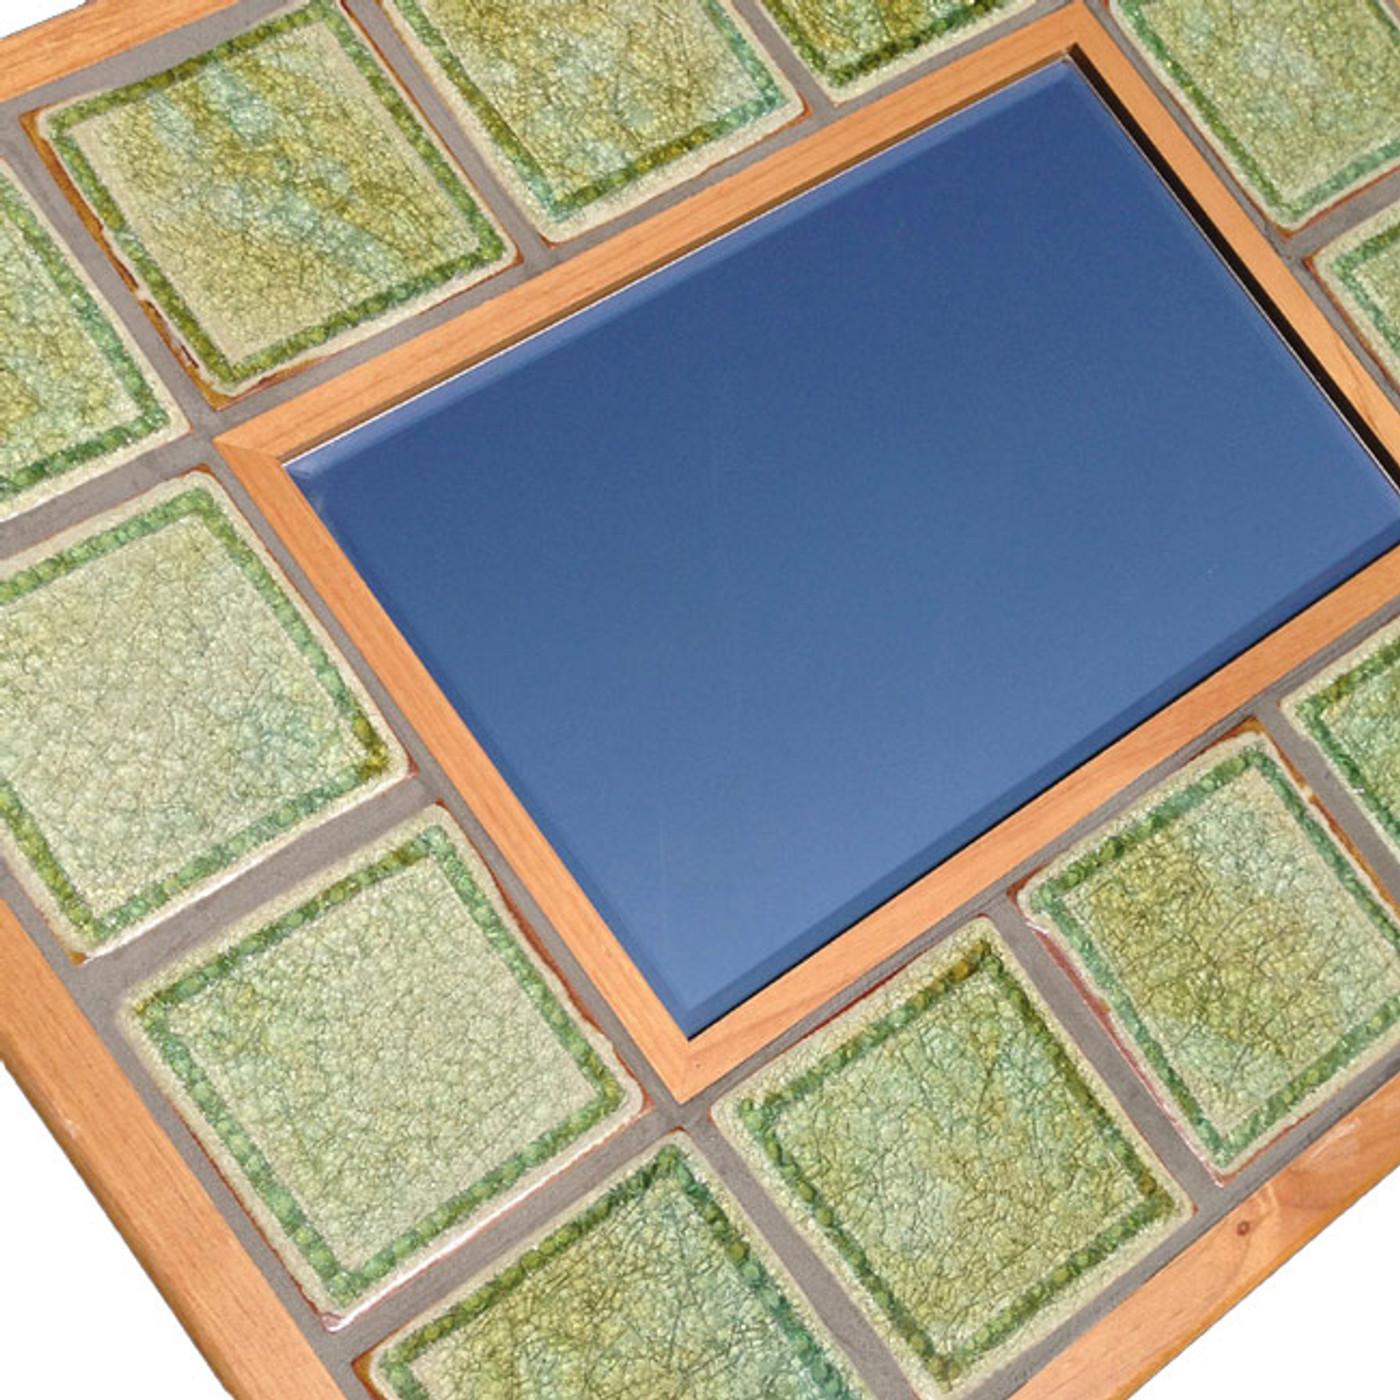 mirror tiled